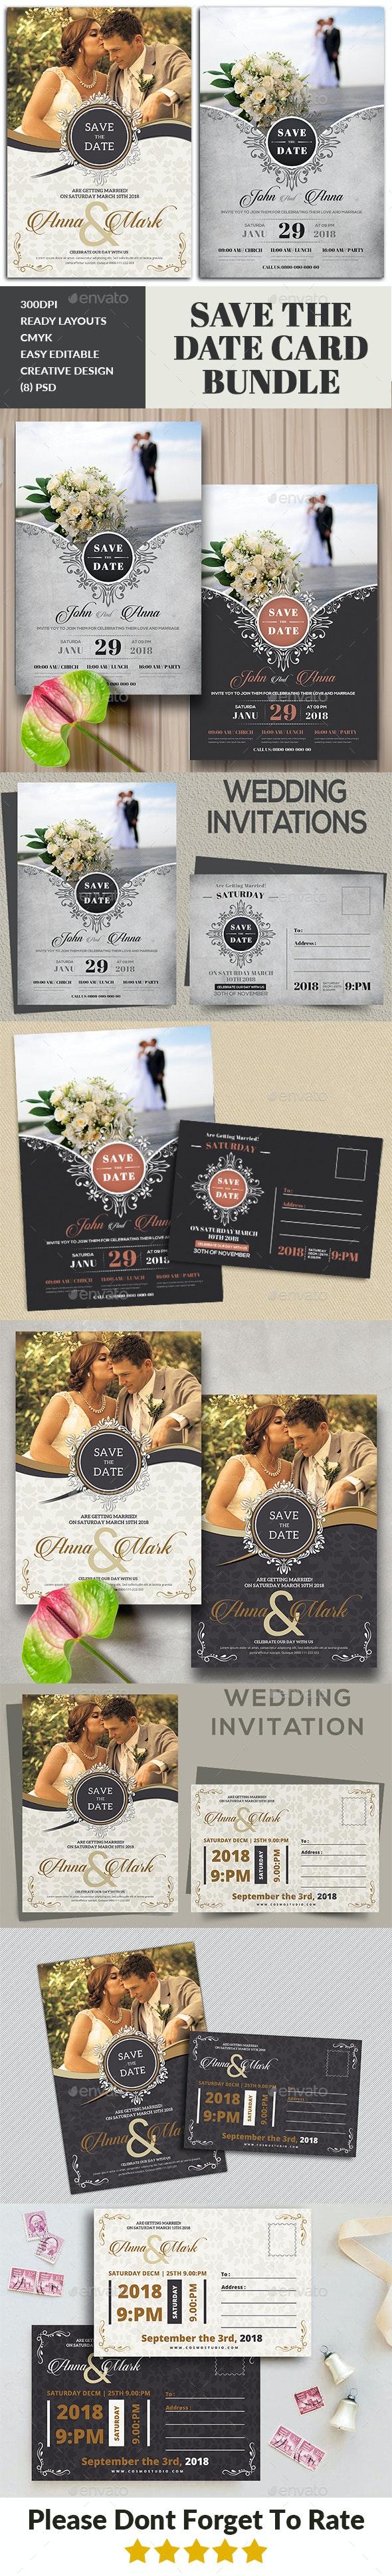 Wedding Invitation Card Bundle - Weddings Cards & Invites